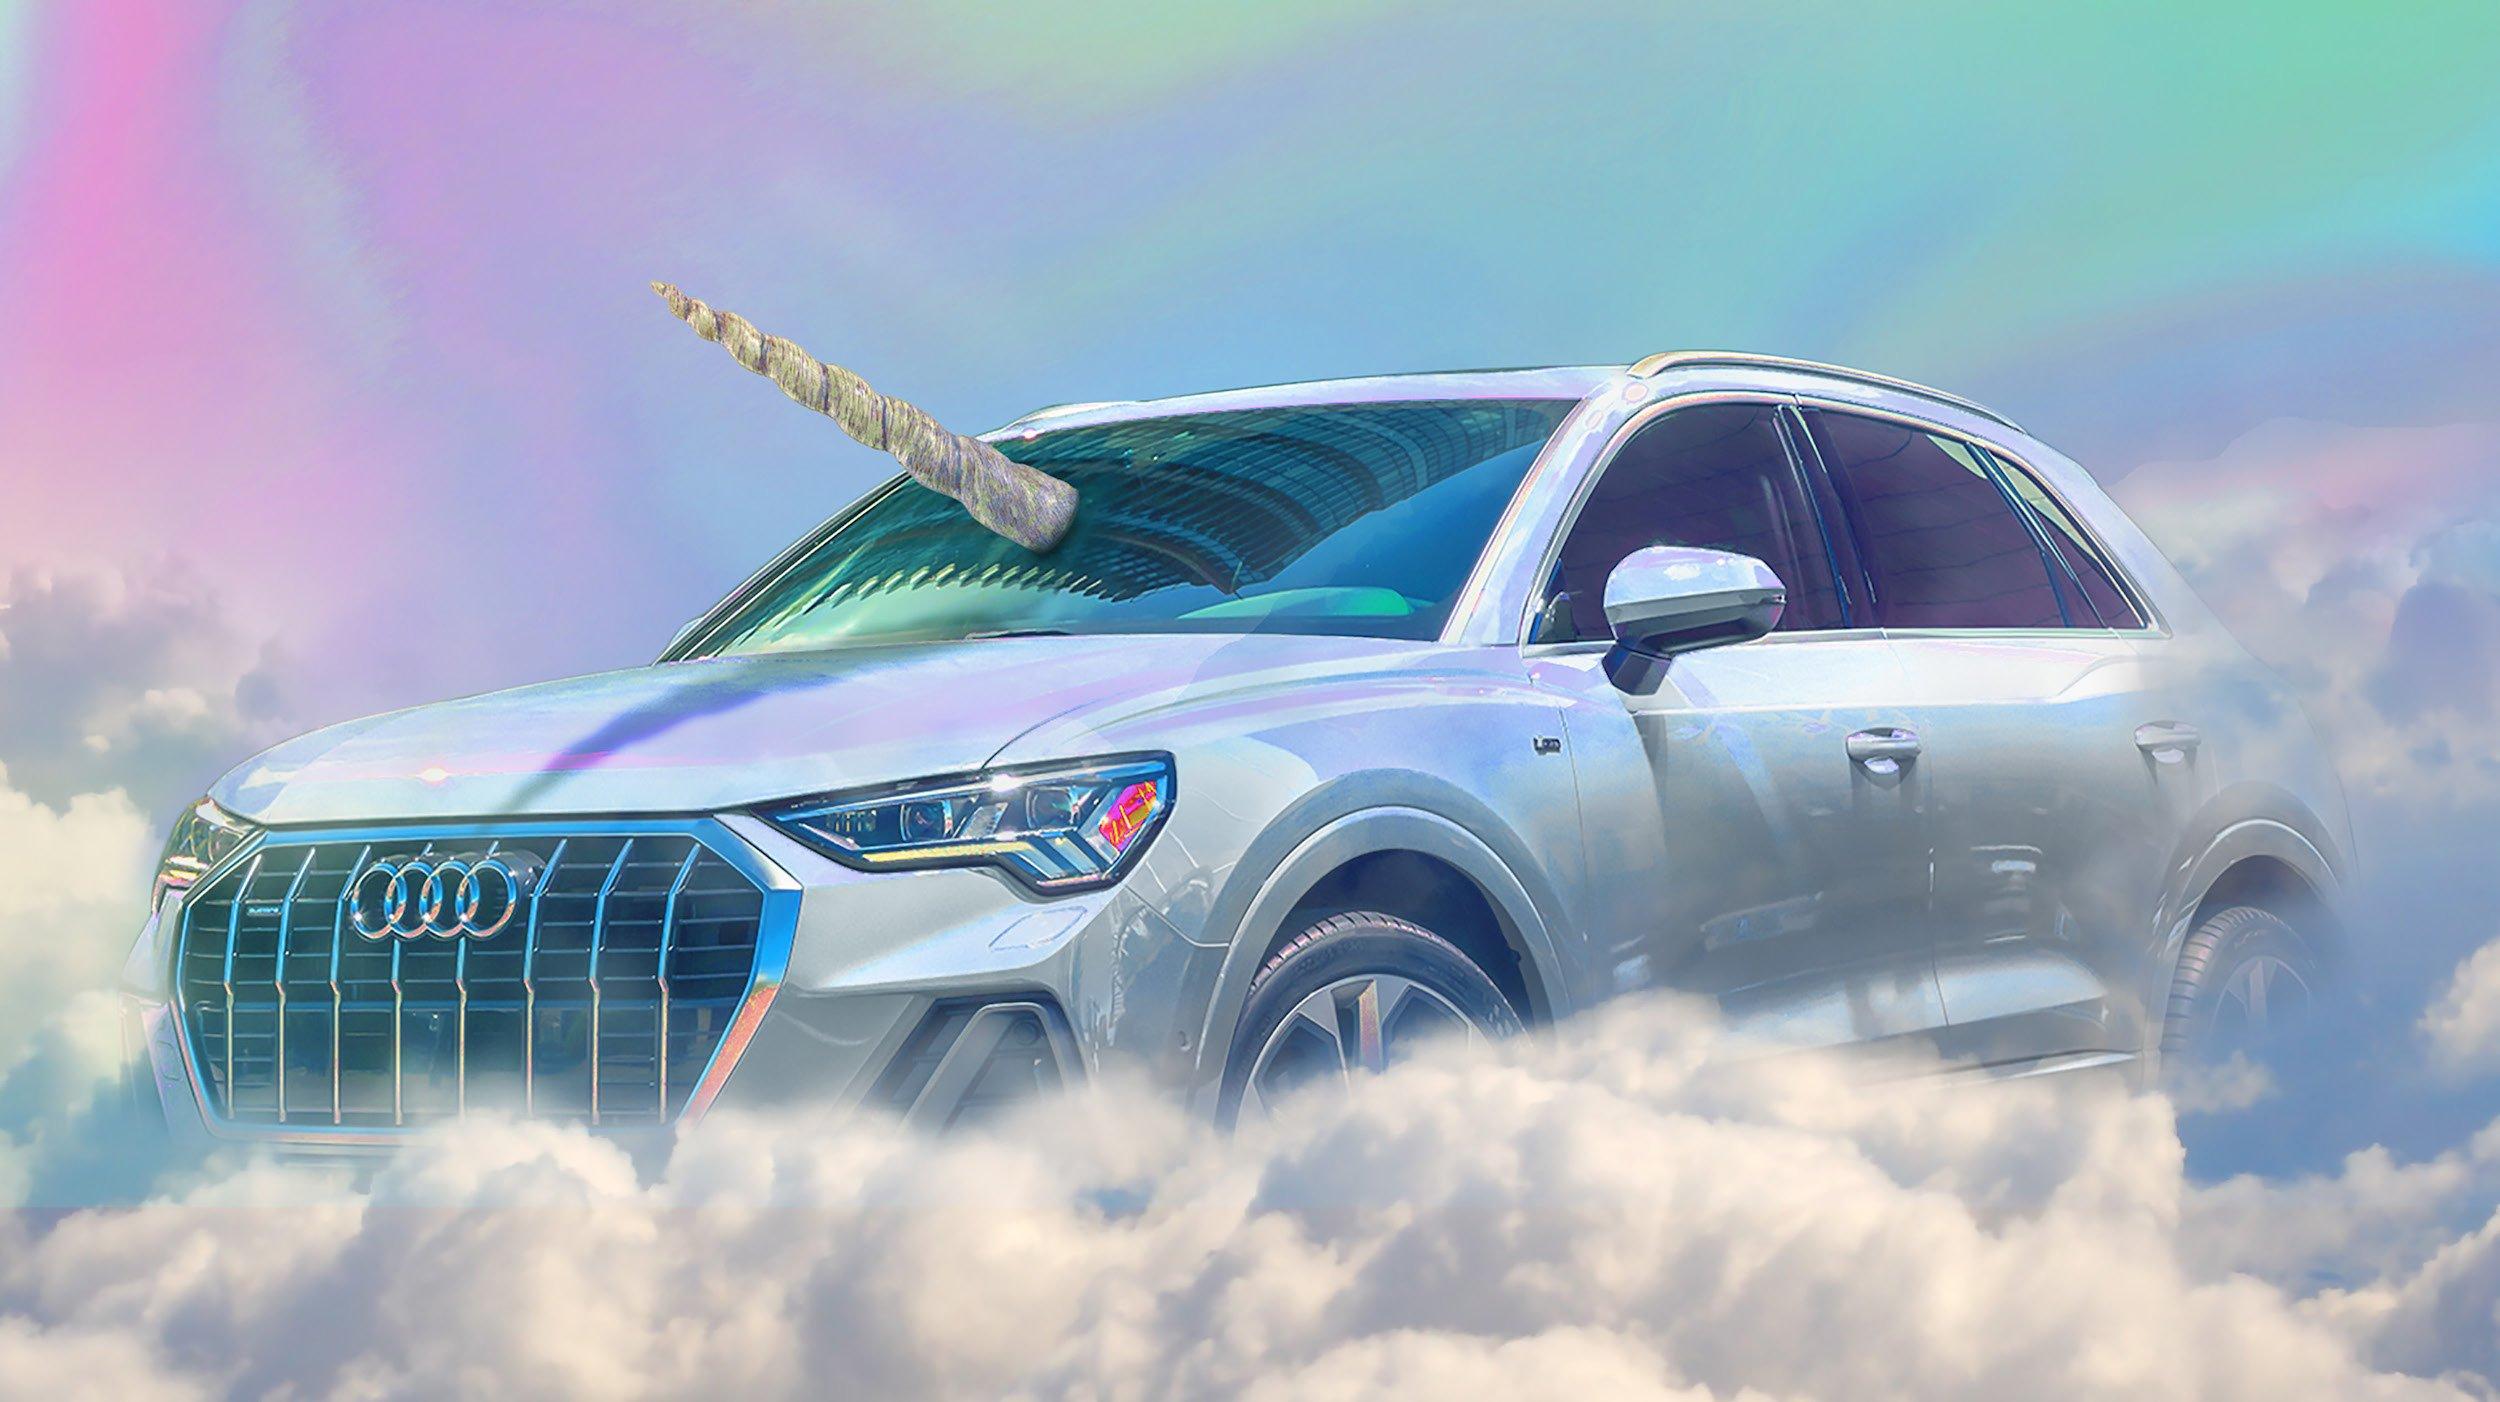 Audi Q3 unicorn 758x425 - Audi Q3 celebrates Halloween by dressing as a unicorn